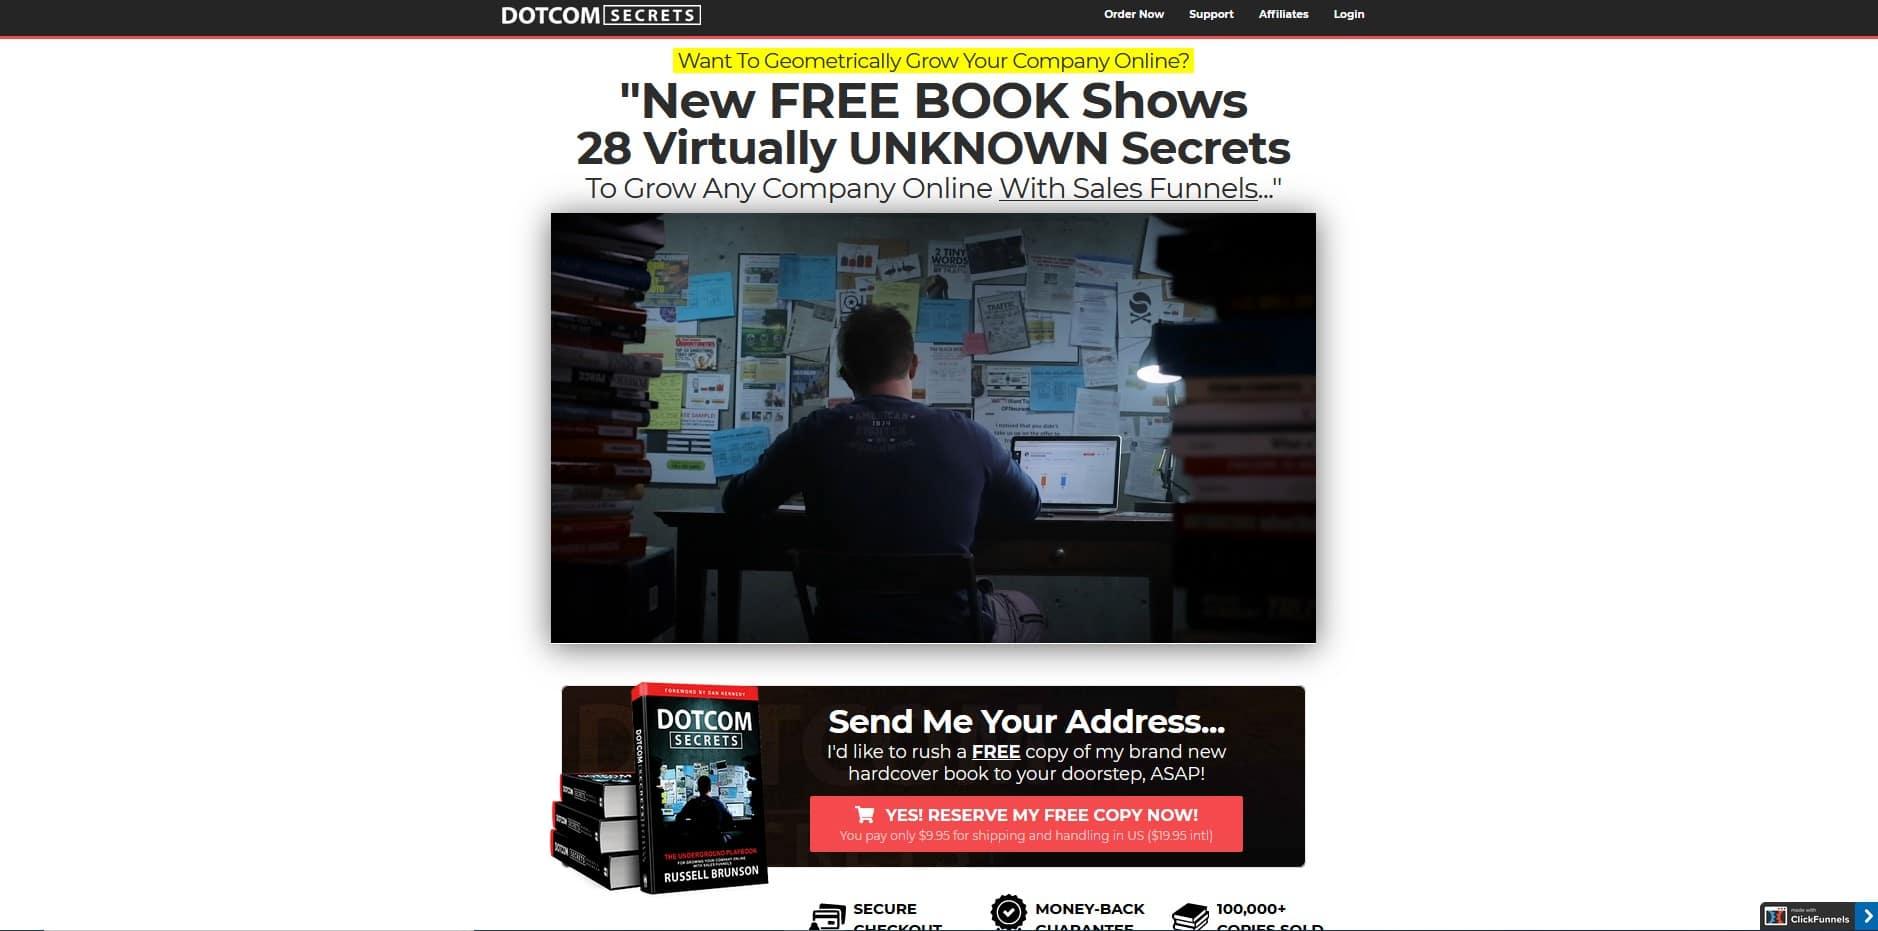 Clickfunnels et Russell Brunson -DotCom secrets en free + shipping